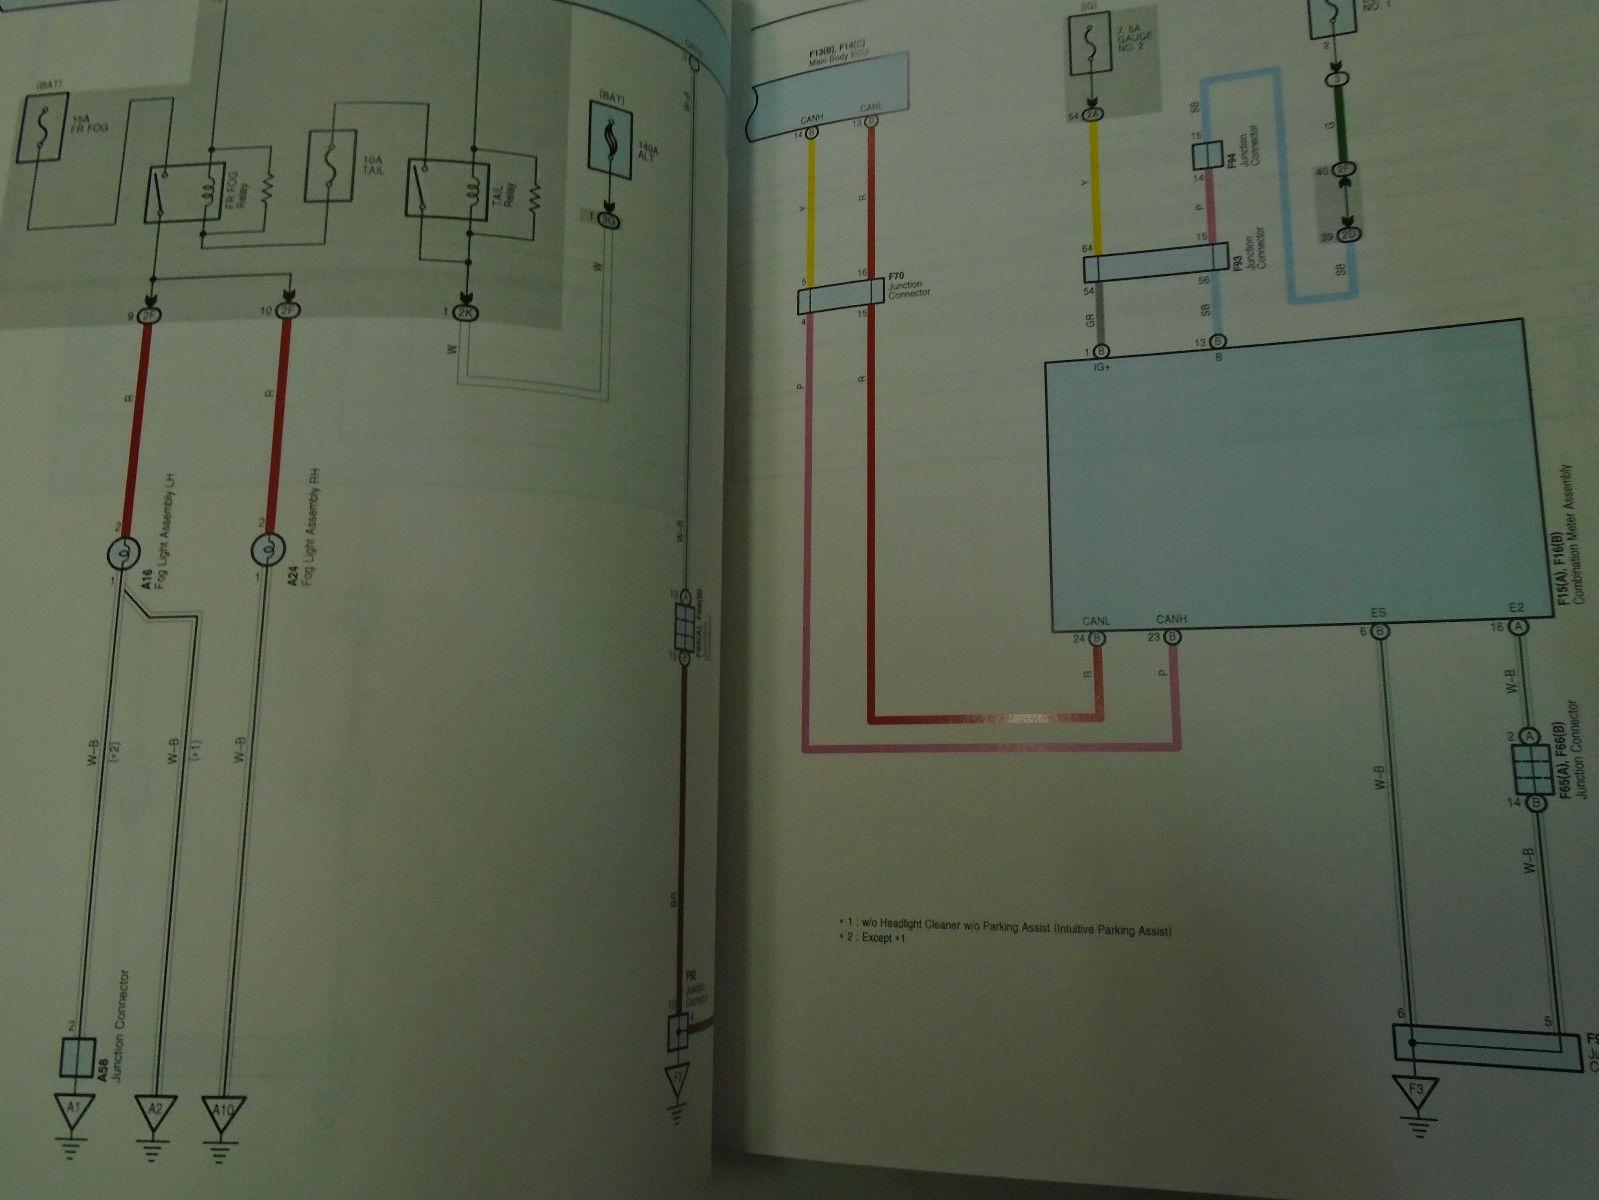 SZ_5462] Lexus Fog Lights Wiring Diagram Wiring DiagramIcand Dupl Mopar Monoc Kicep Istic Amenti Epsy Pead Favo Scoba  Mohammedshrine Librar Wiring 101